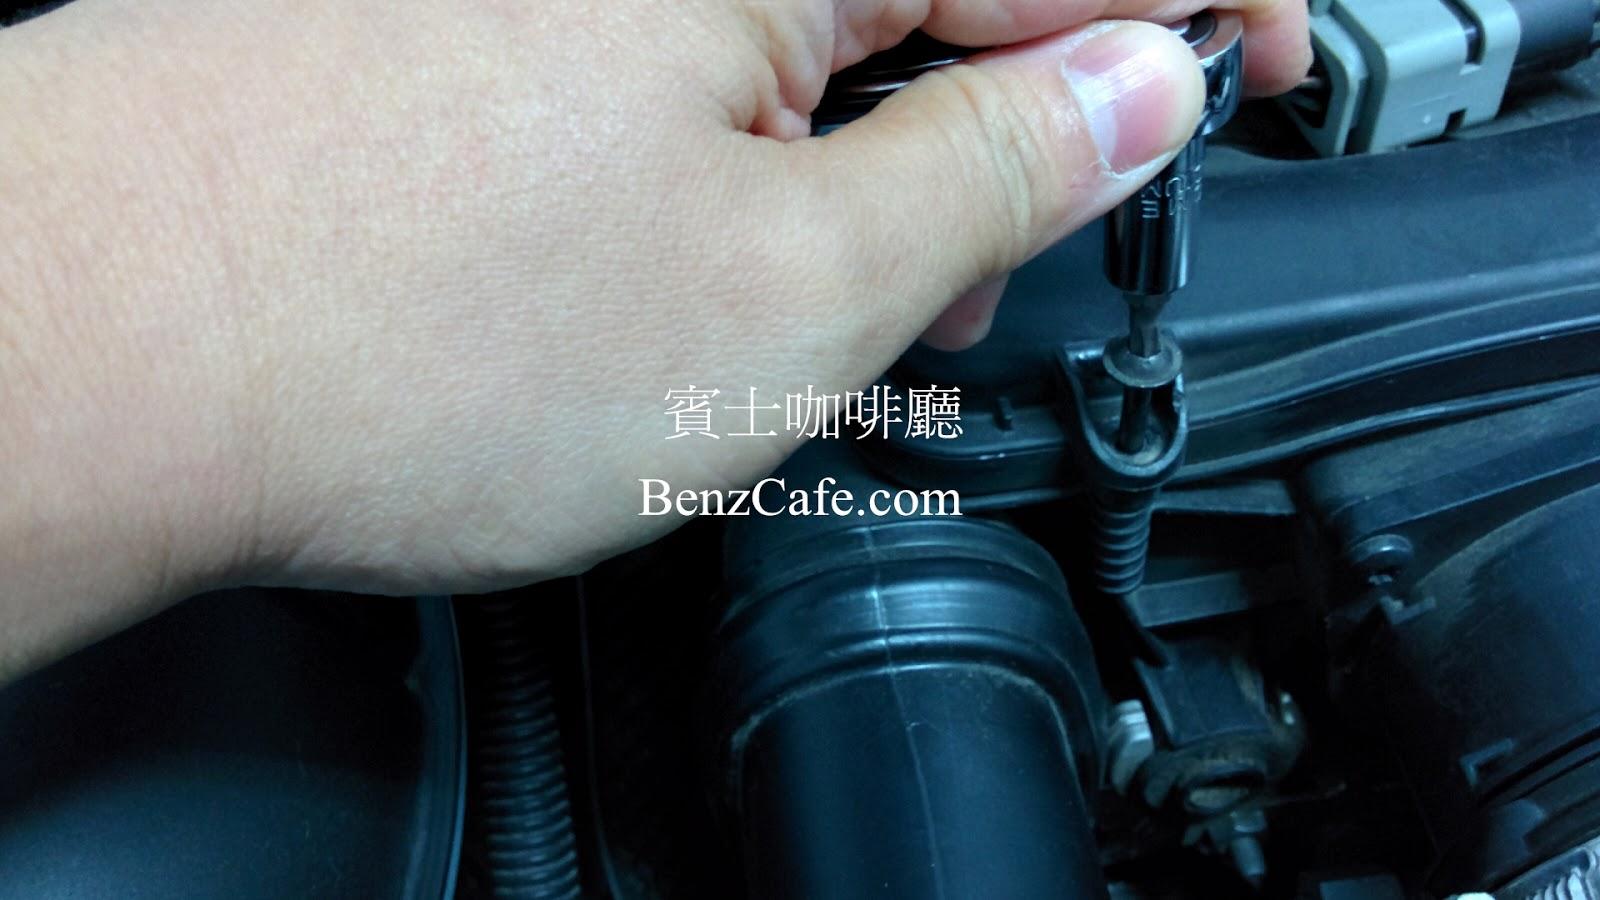 賓士咖啡廳 2.0 - US MB Coffee Shop: W212 E220 更換空氣濾清器 (Engine air filter) DIY (OM651 引擎適用)